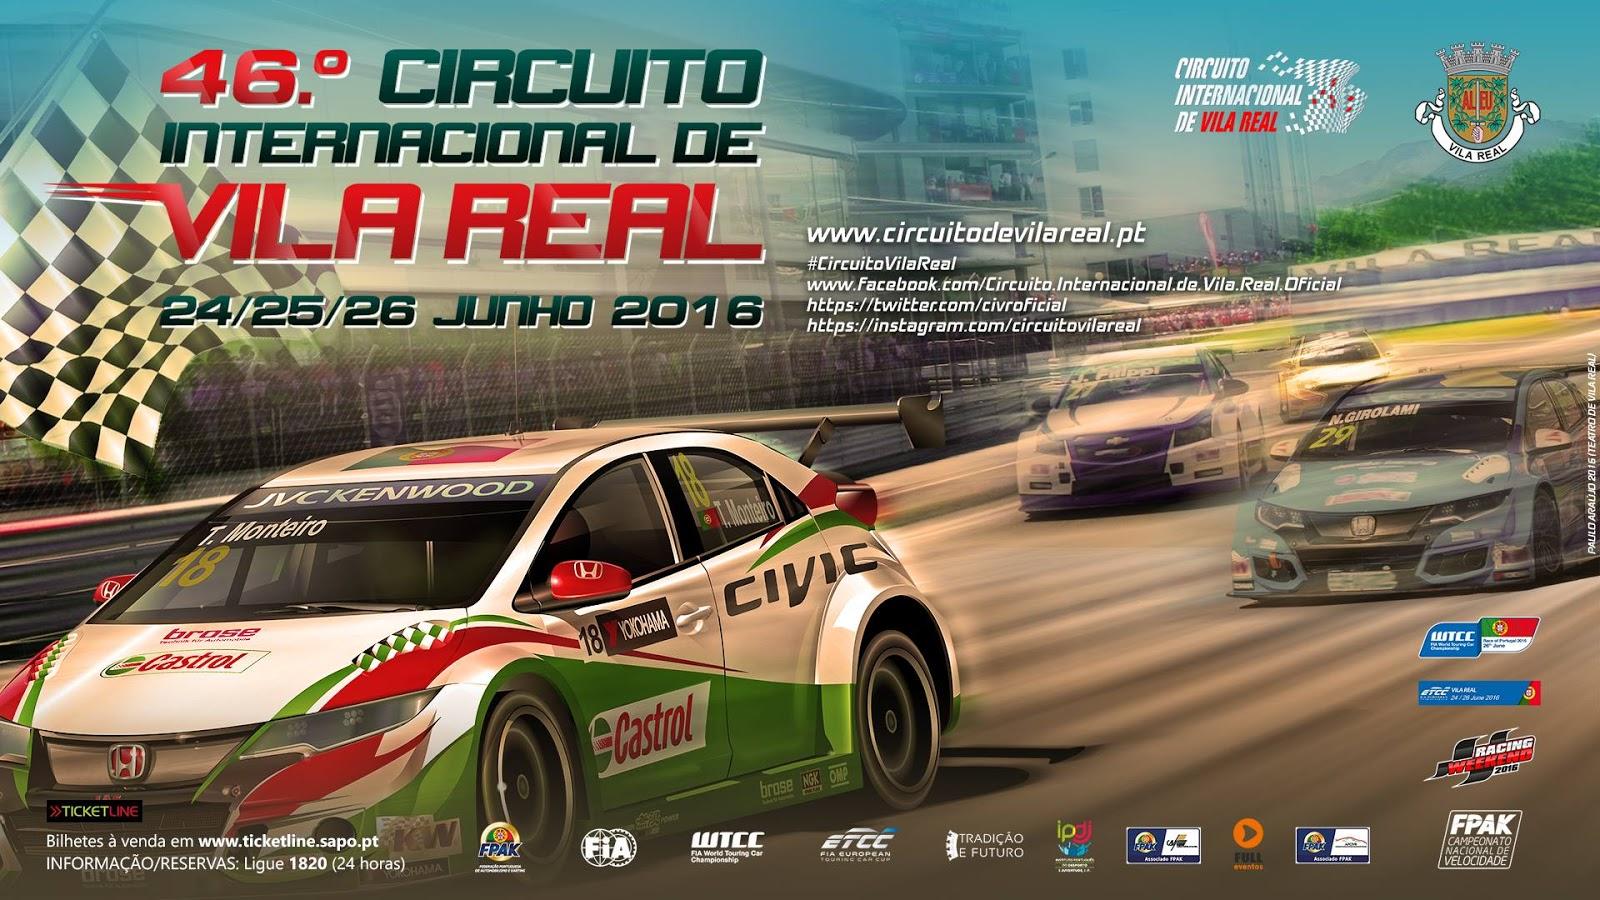 Circuito Vila Real : Bilhetes para o º circuito já à venda vila real online